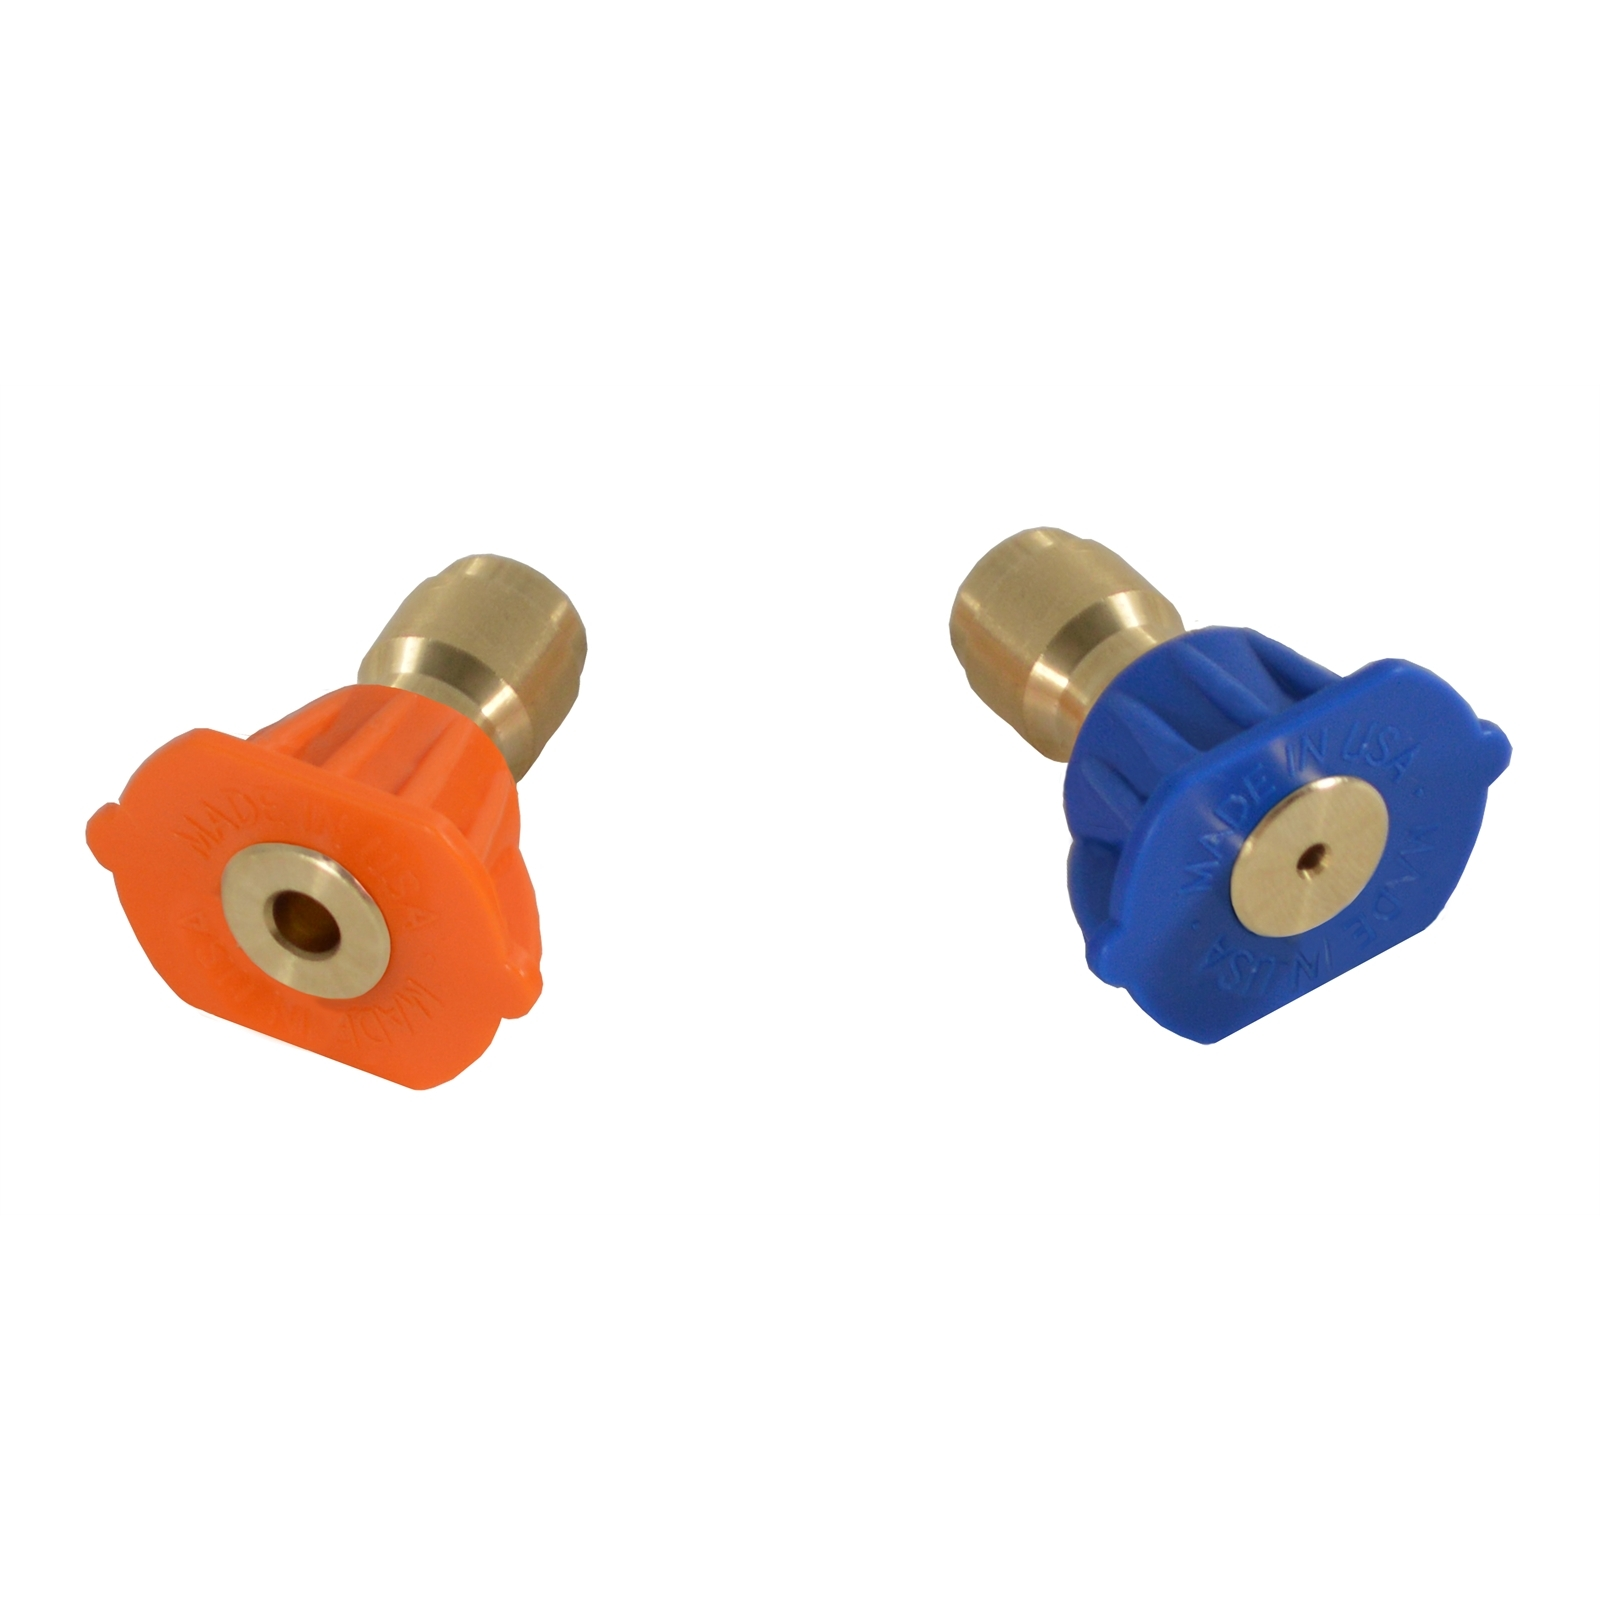 DeWALT High Reach Pressure Washer Nozzle Kit - 2 Pack